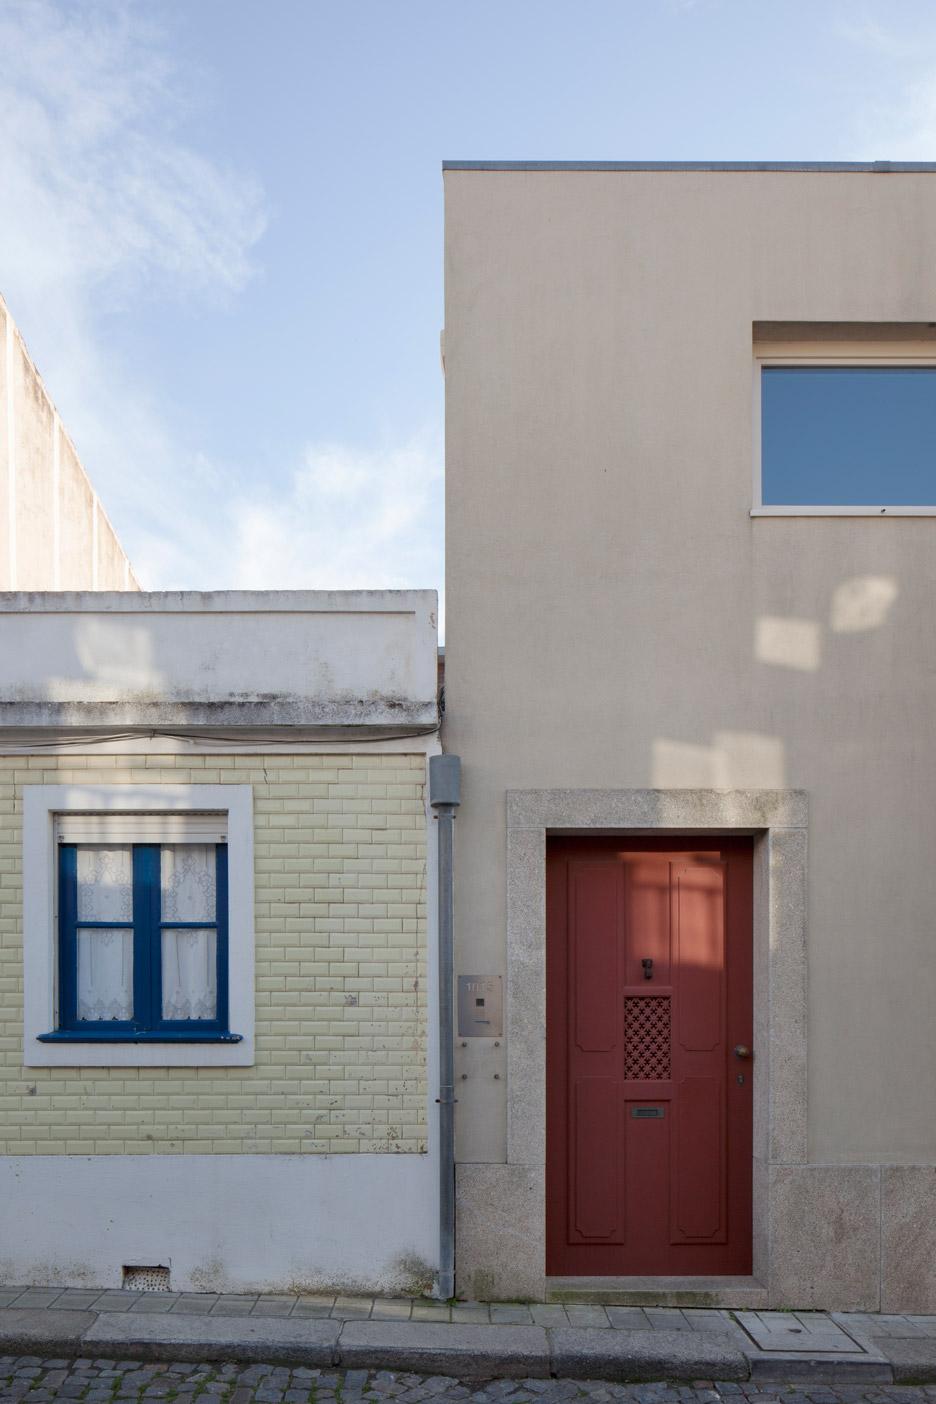 Architecture-courtyard-design-studia-interiors-osnovadesign-osnova-poltava-19